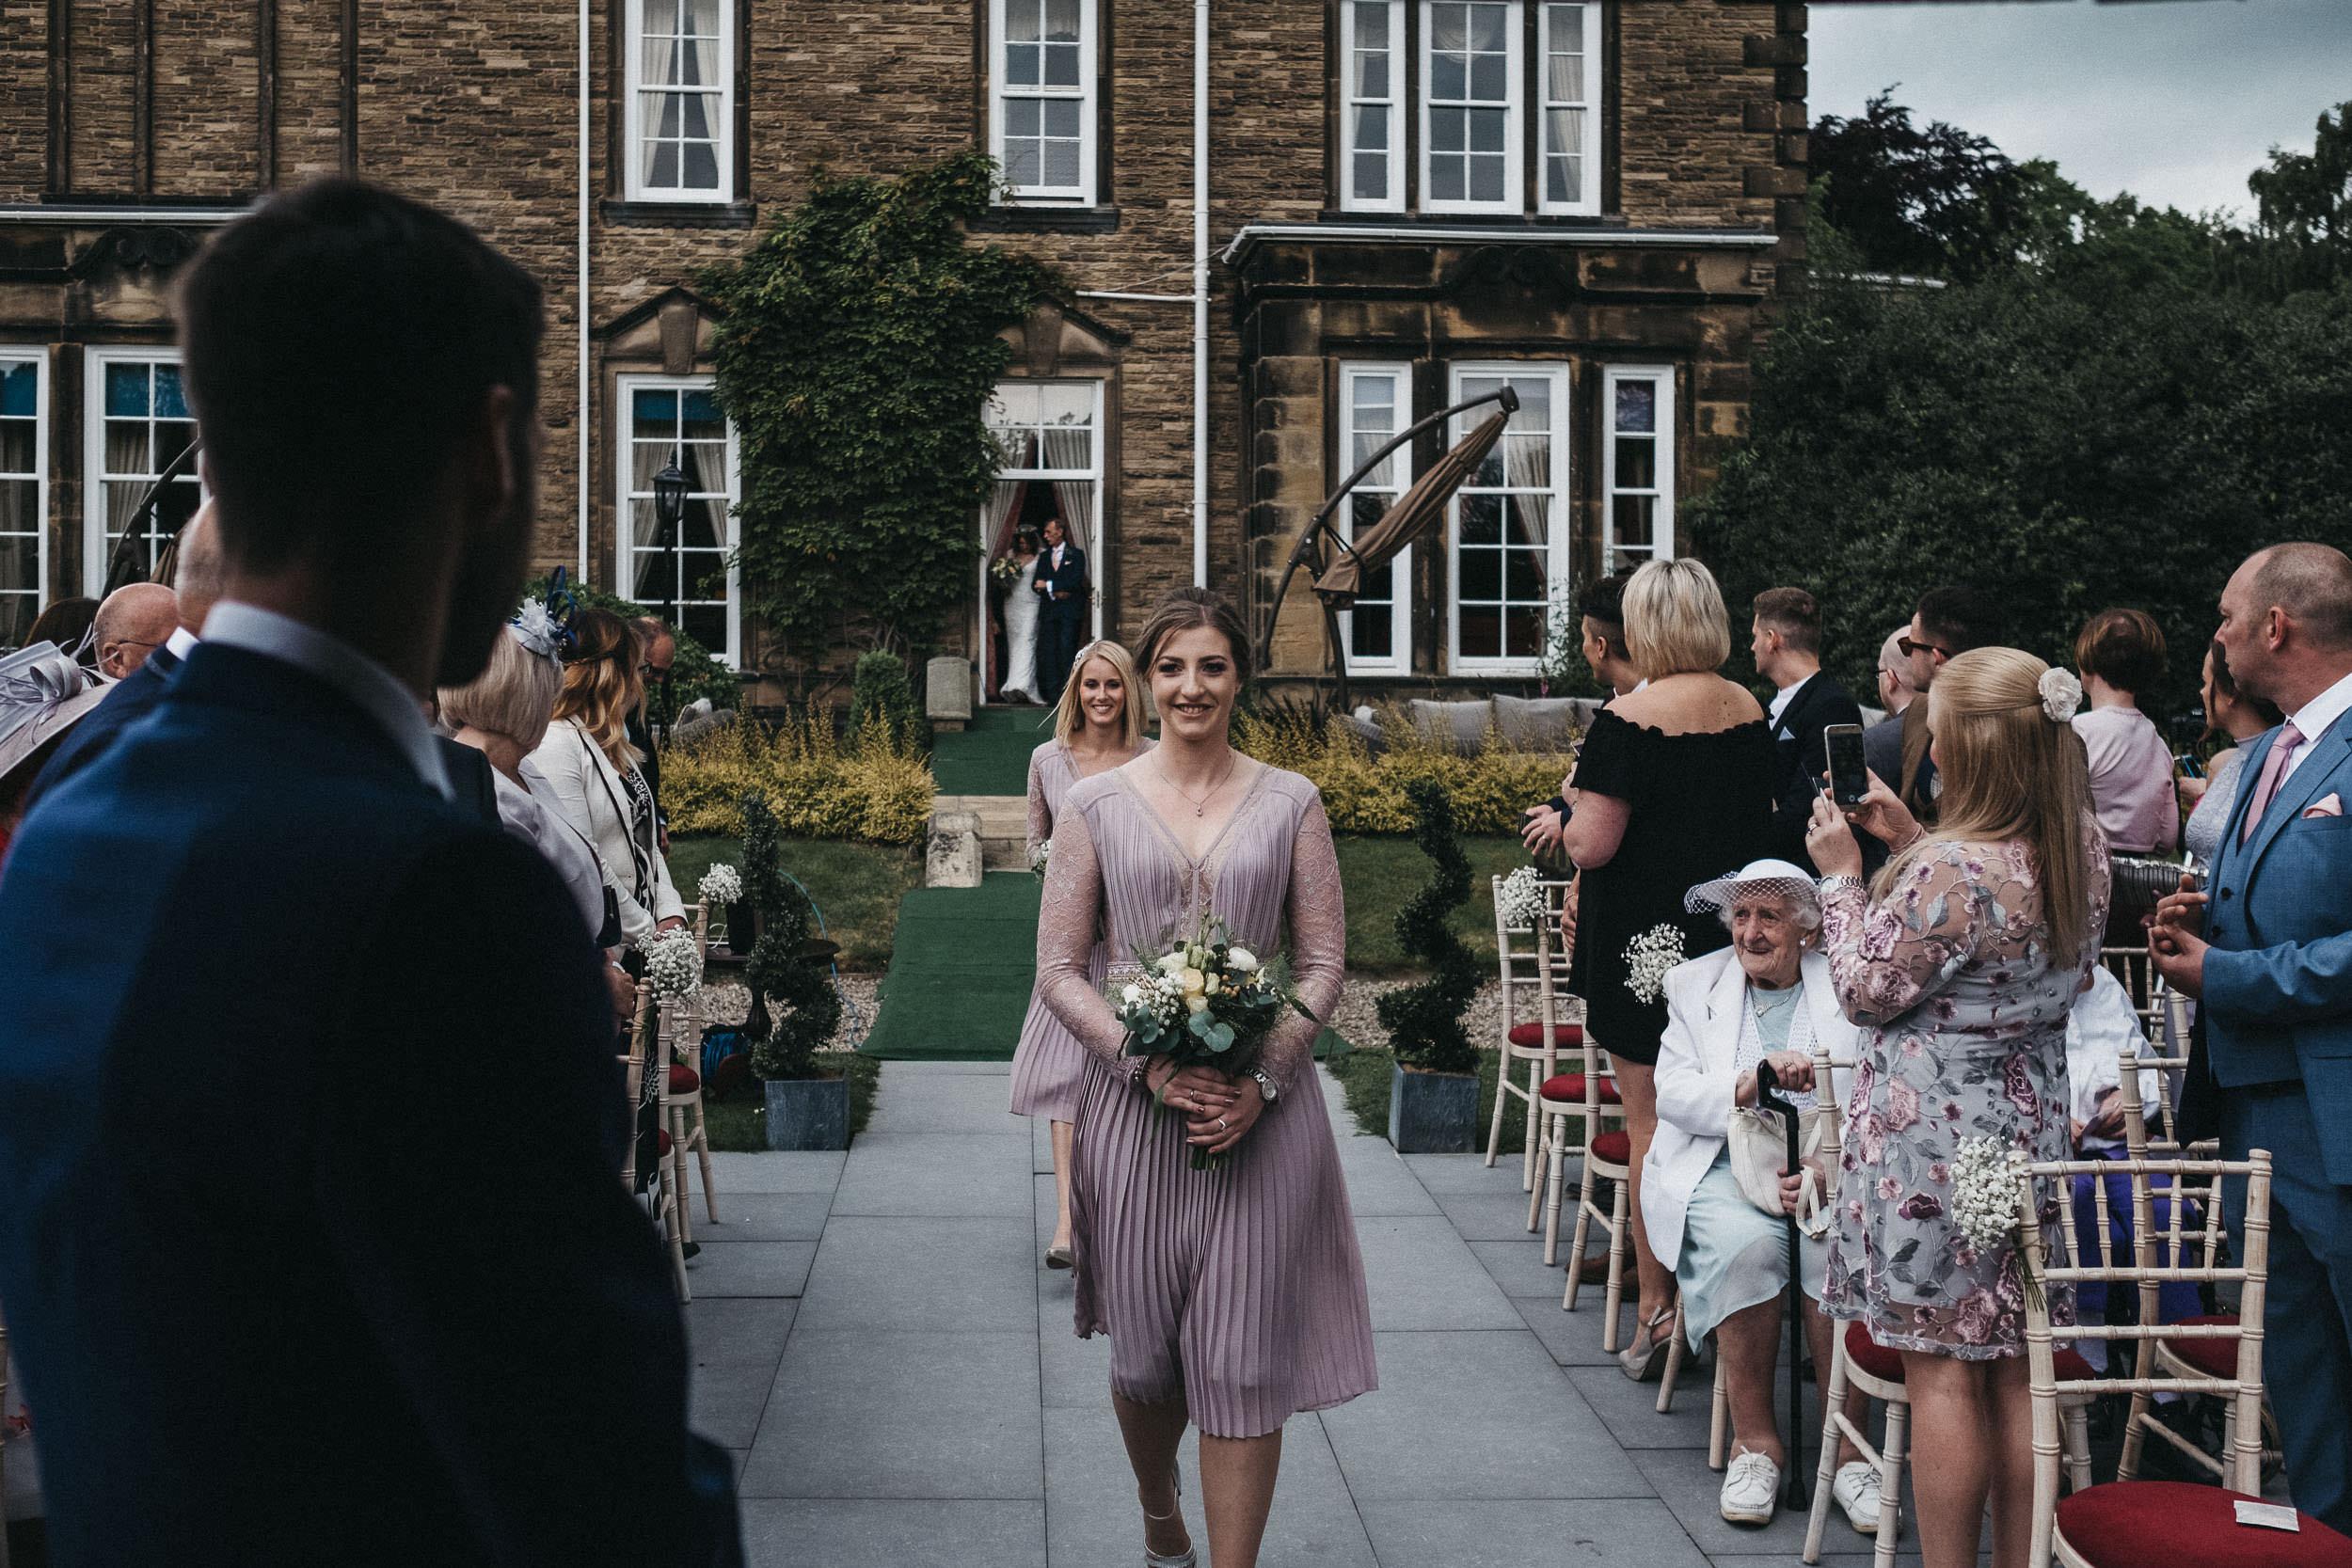 Bridesmaids walk down aisle smiling